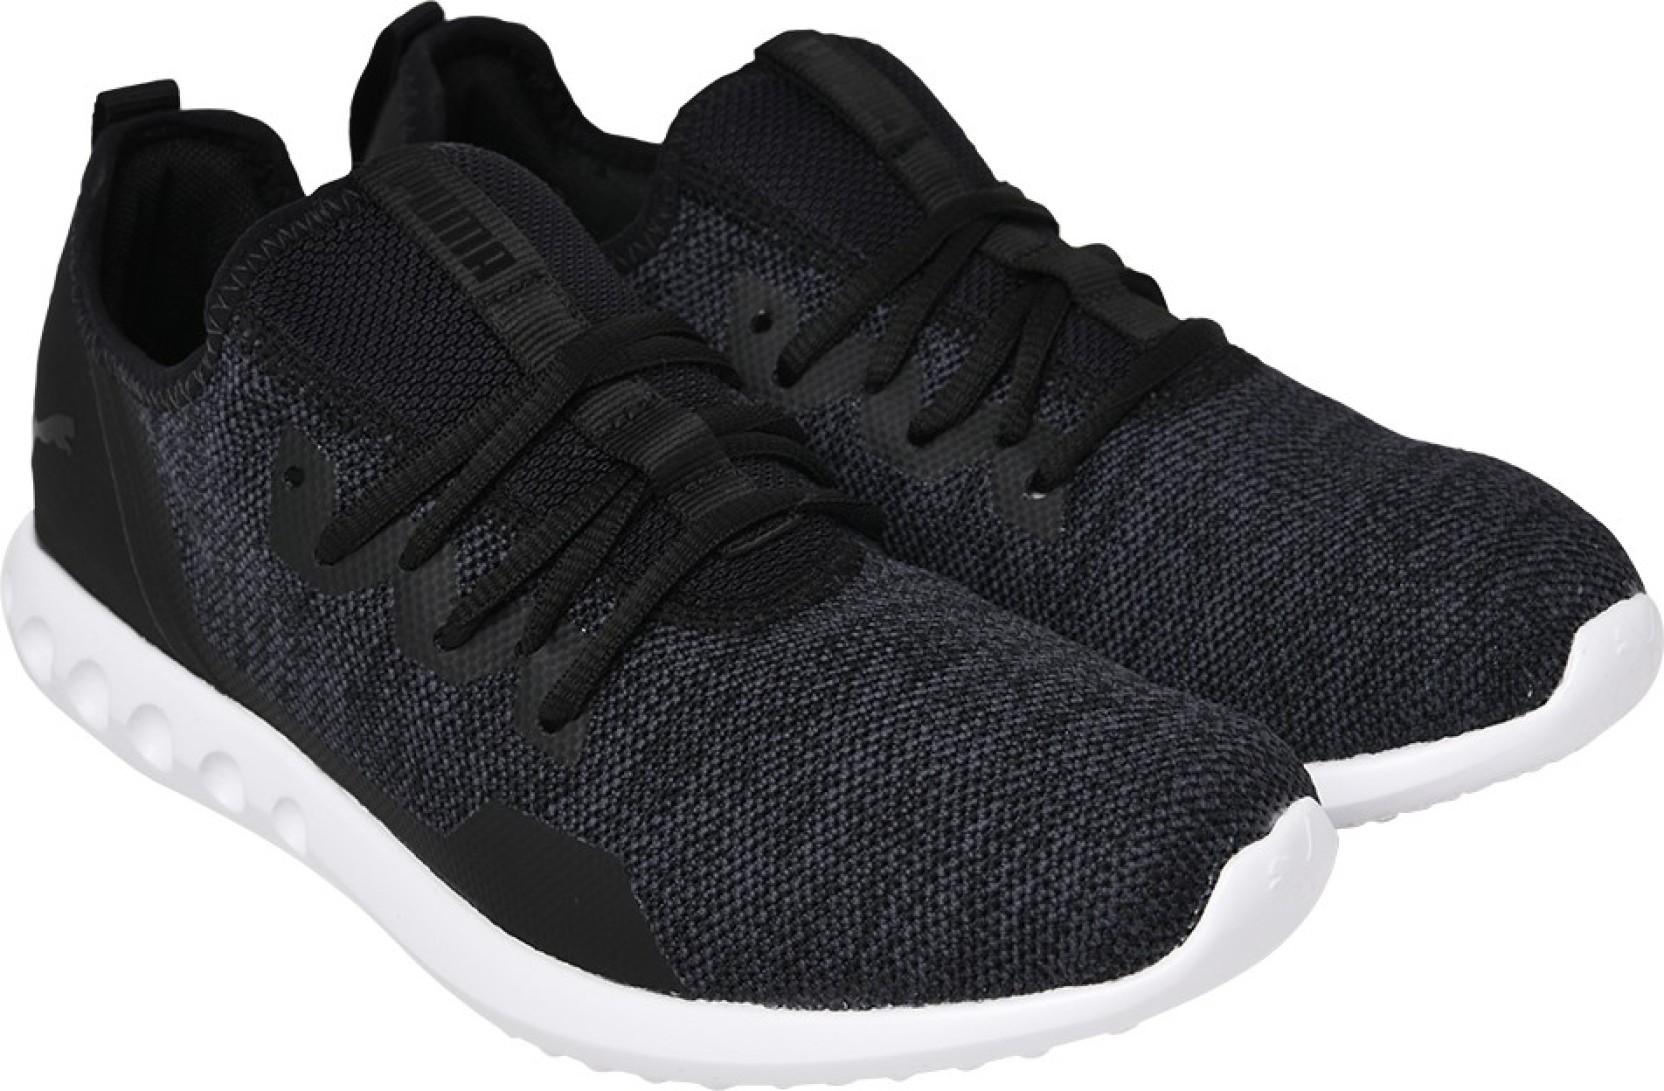 Puma Carson 2 X Knit IDP Walking Shoes For Men - Buy Puma Carson 2 X ... f2c85e2cc